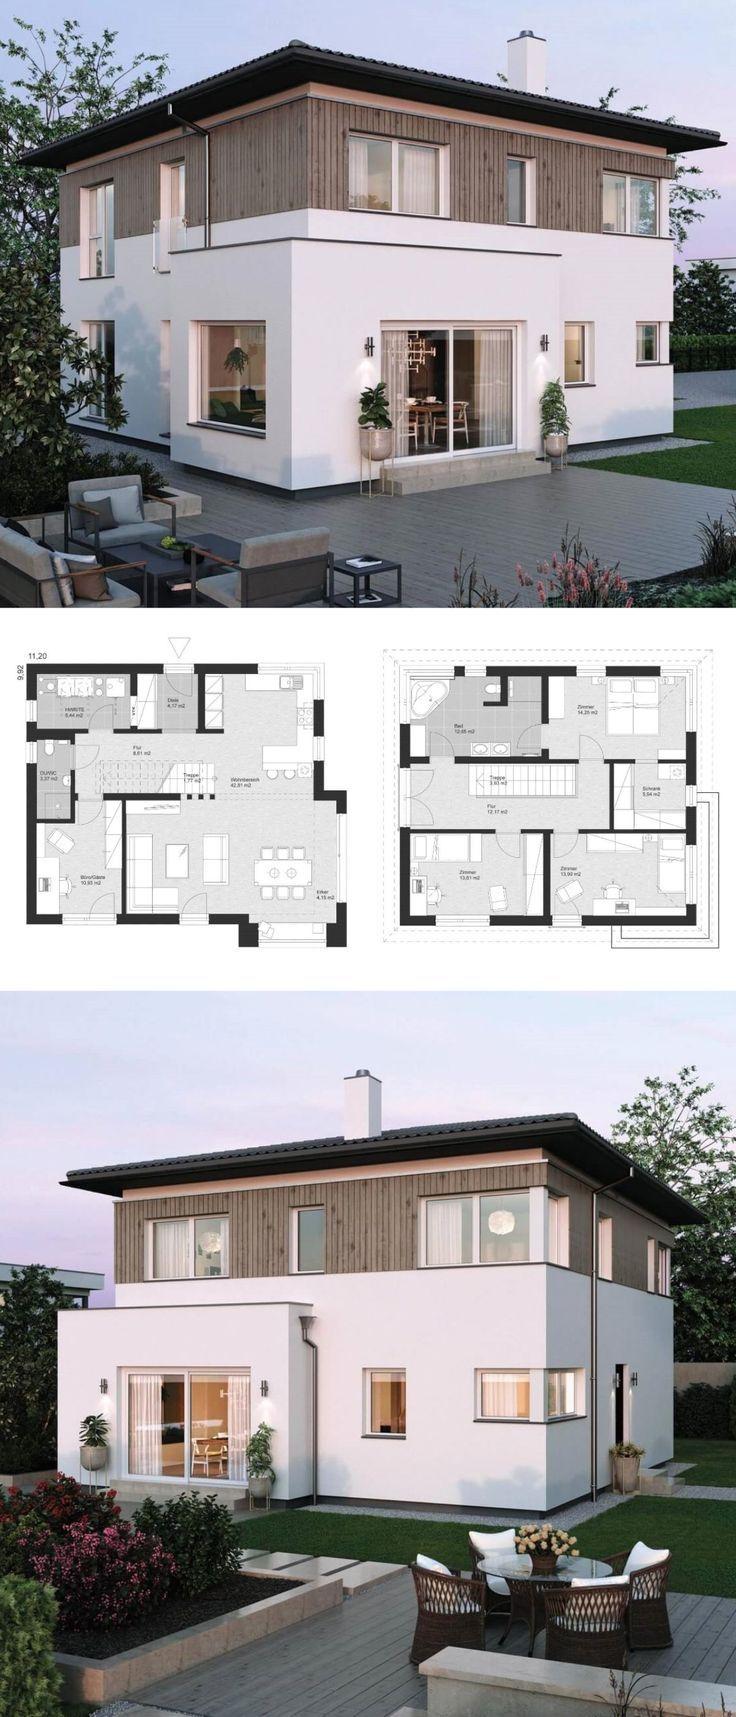 Moderne Stadtvilla ELK Haus 155 ELK Fertighaus